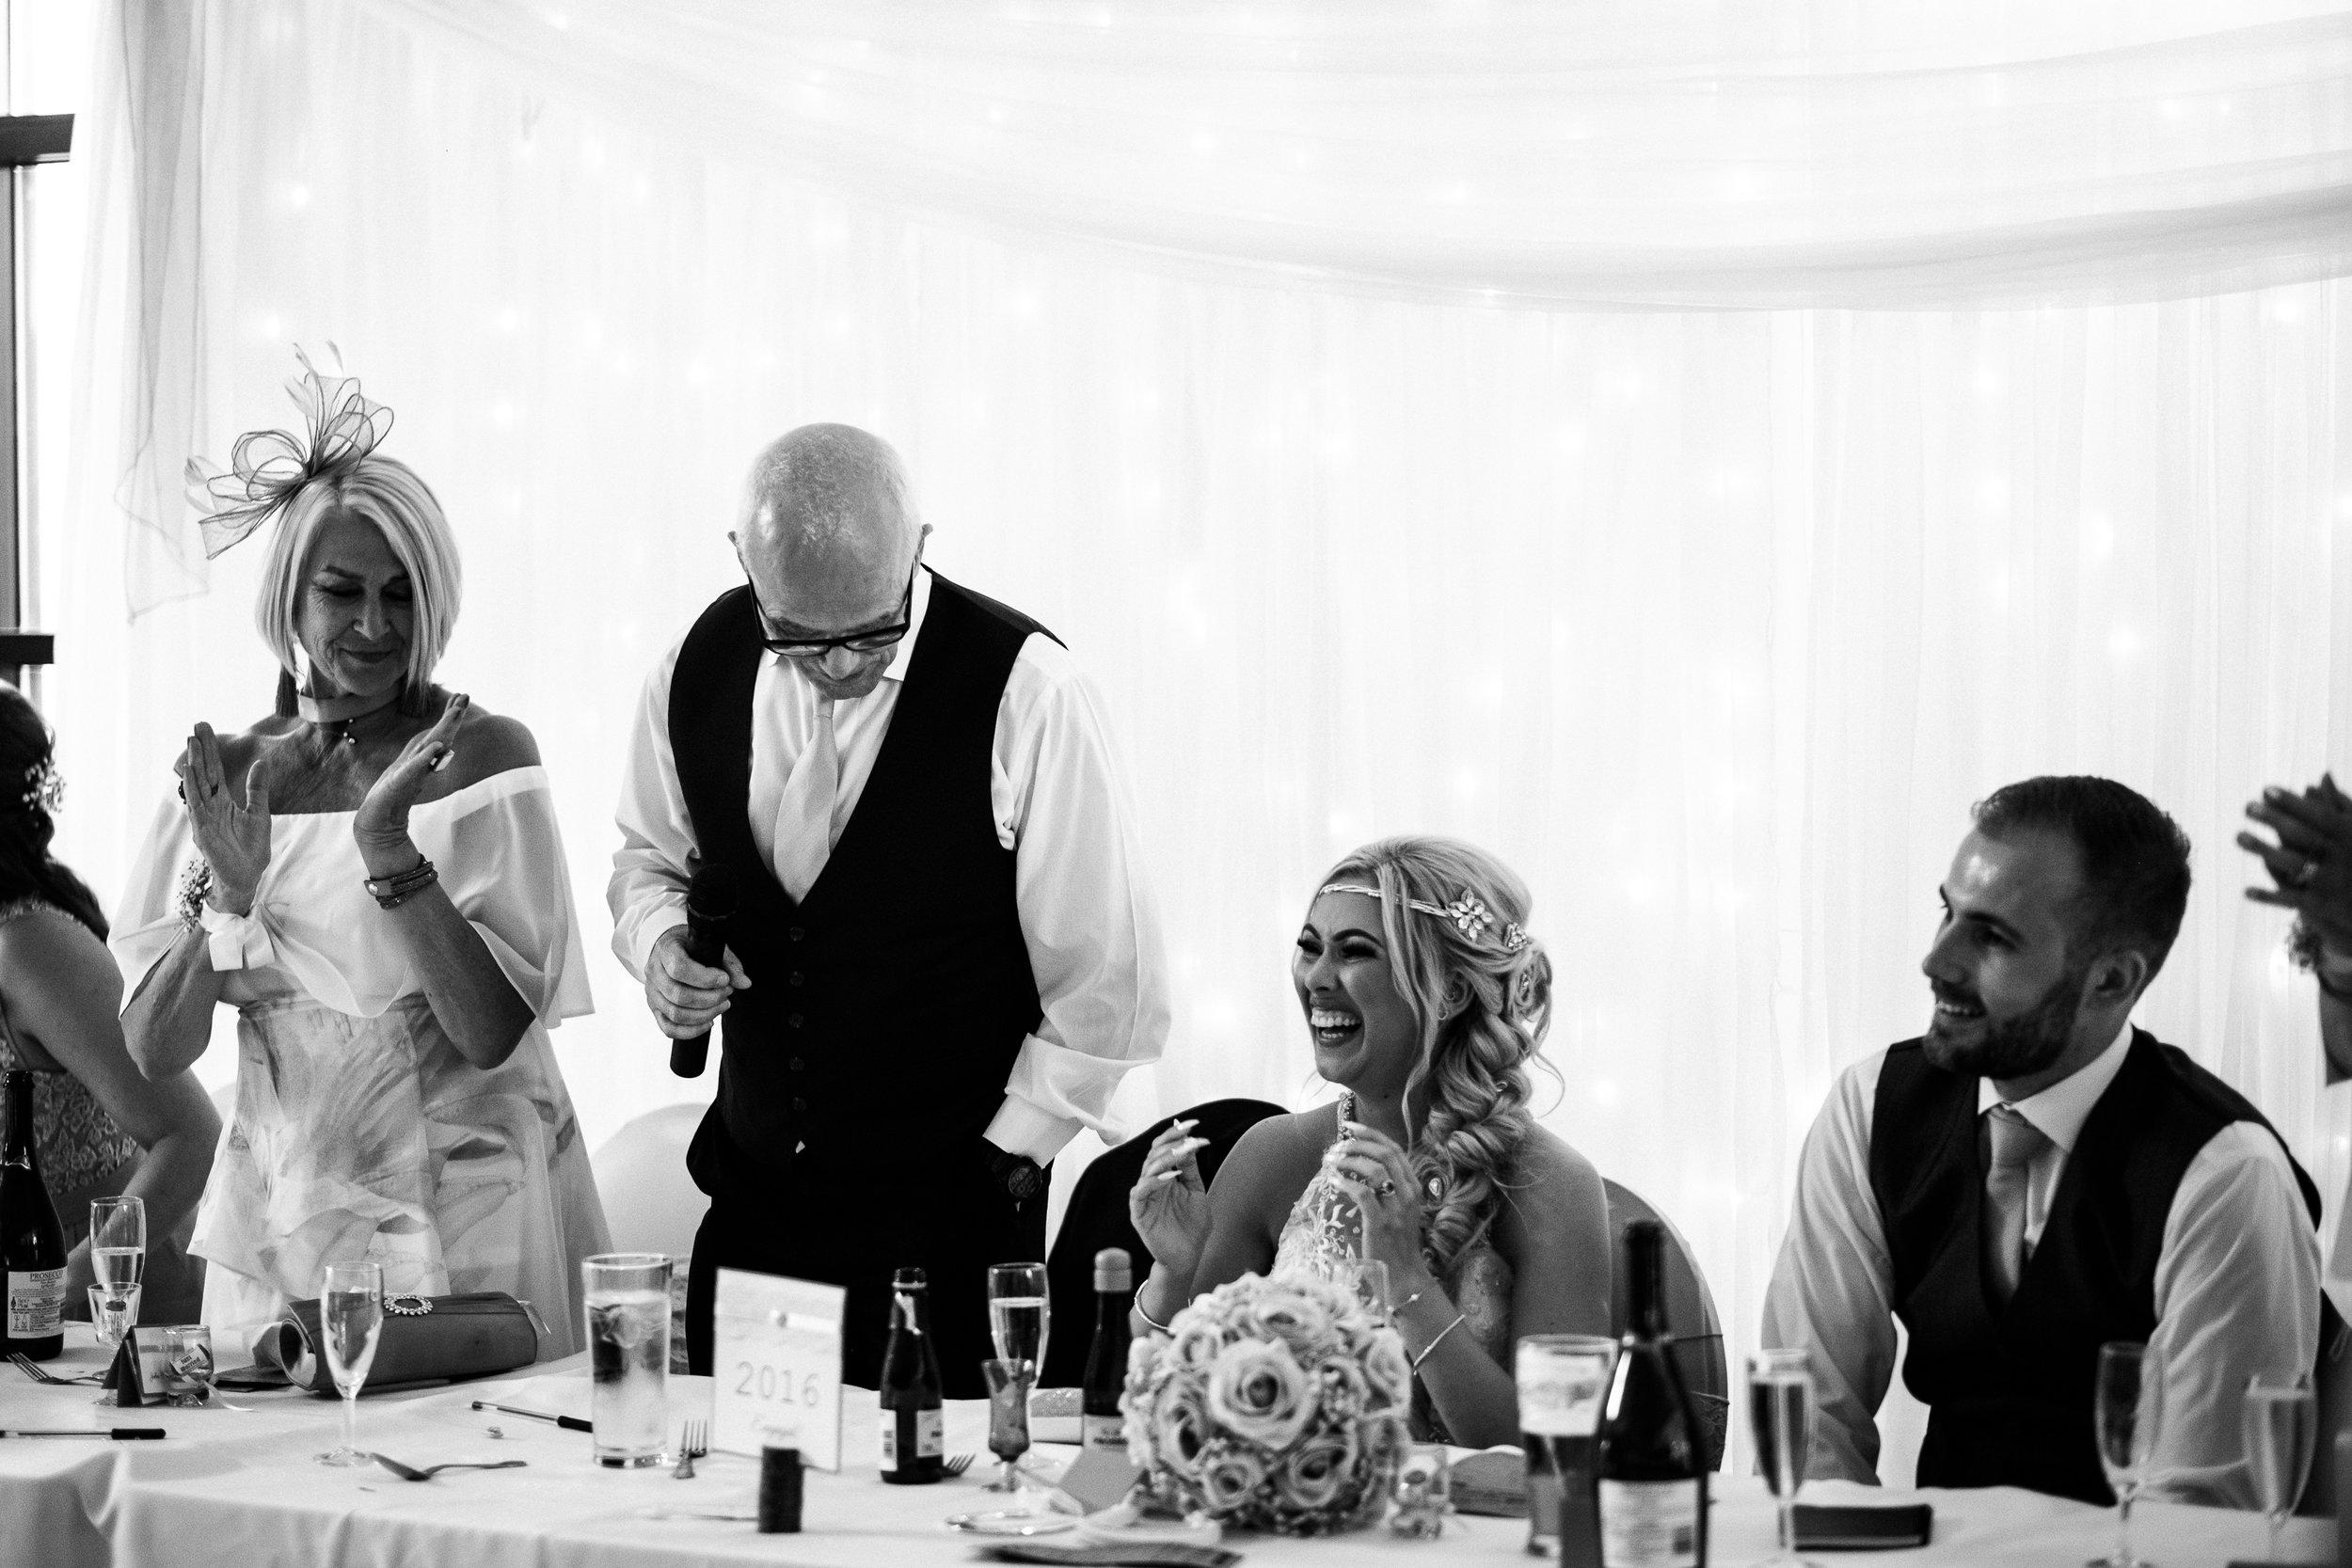 Summer Documentary Wedding Photography Floral Hall, Stoke-on-Trent, Staffordshire - Jenny Harper-42.jpg